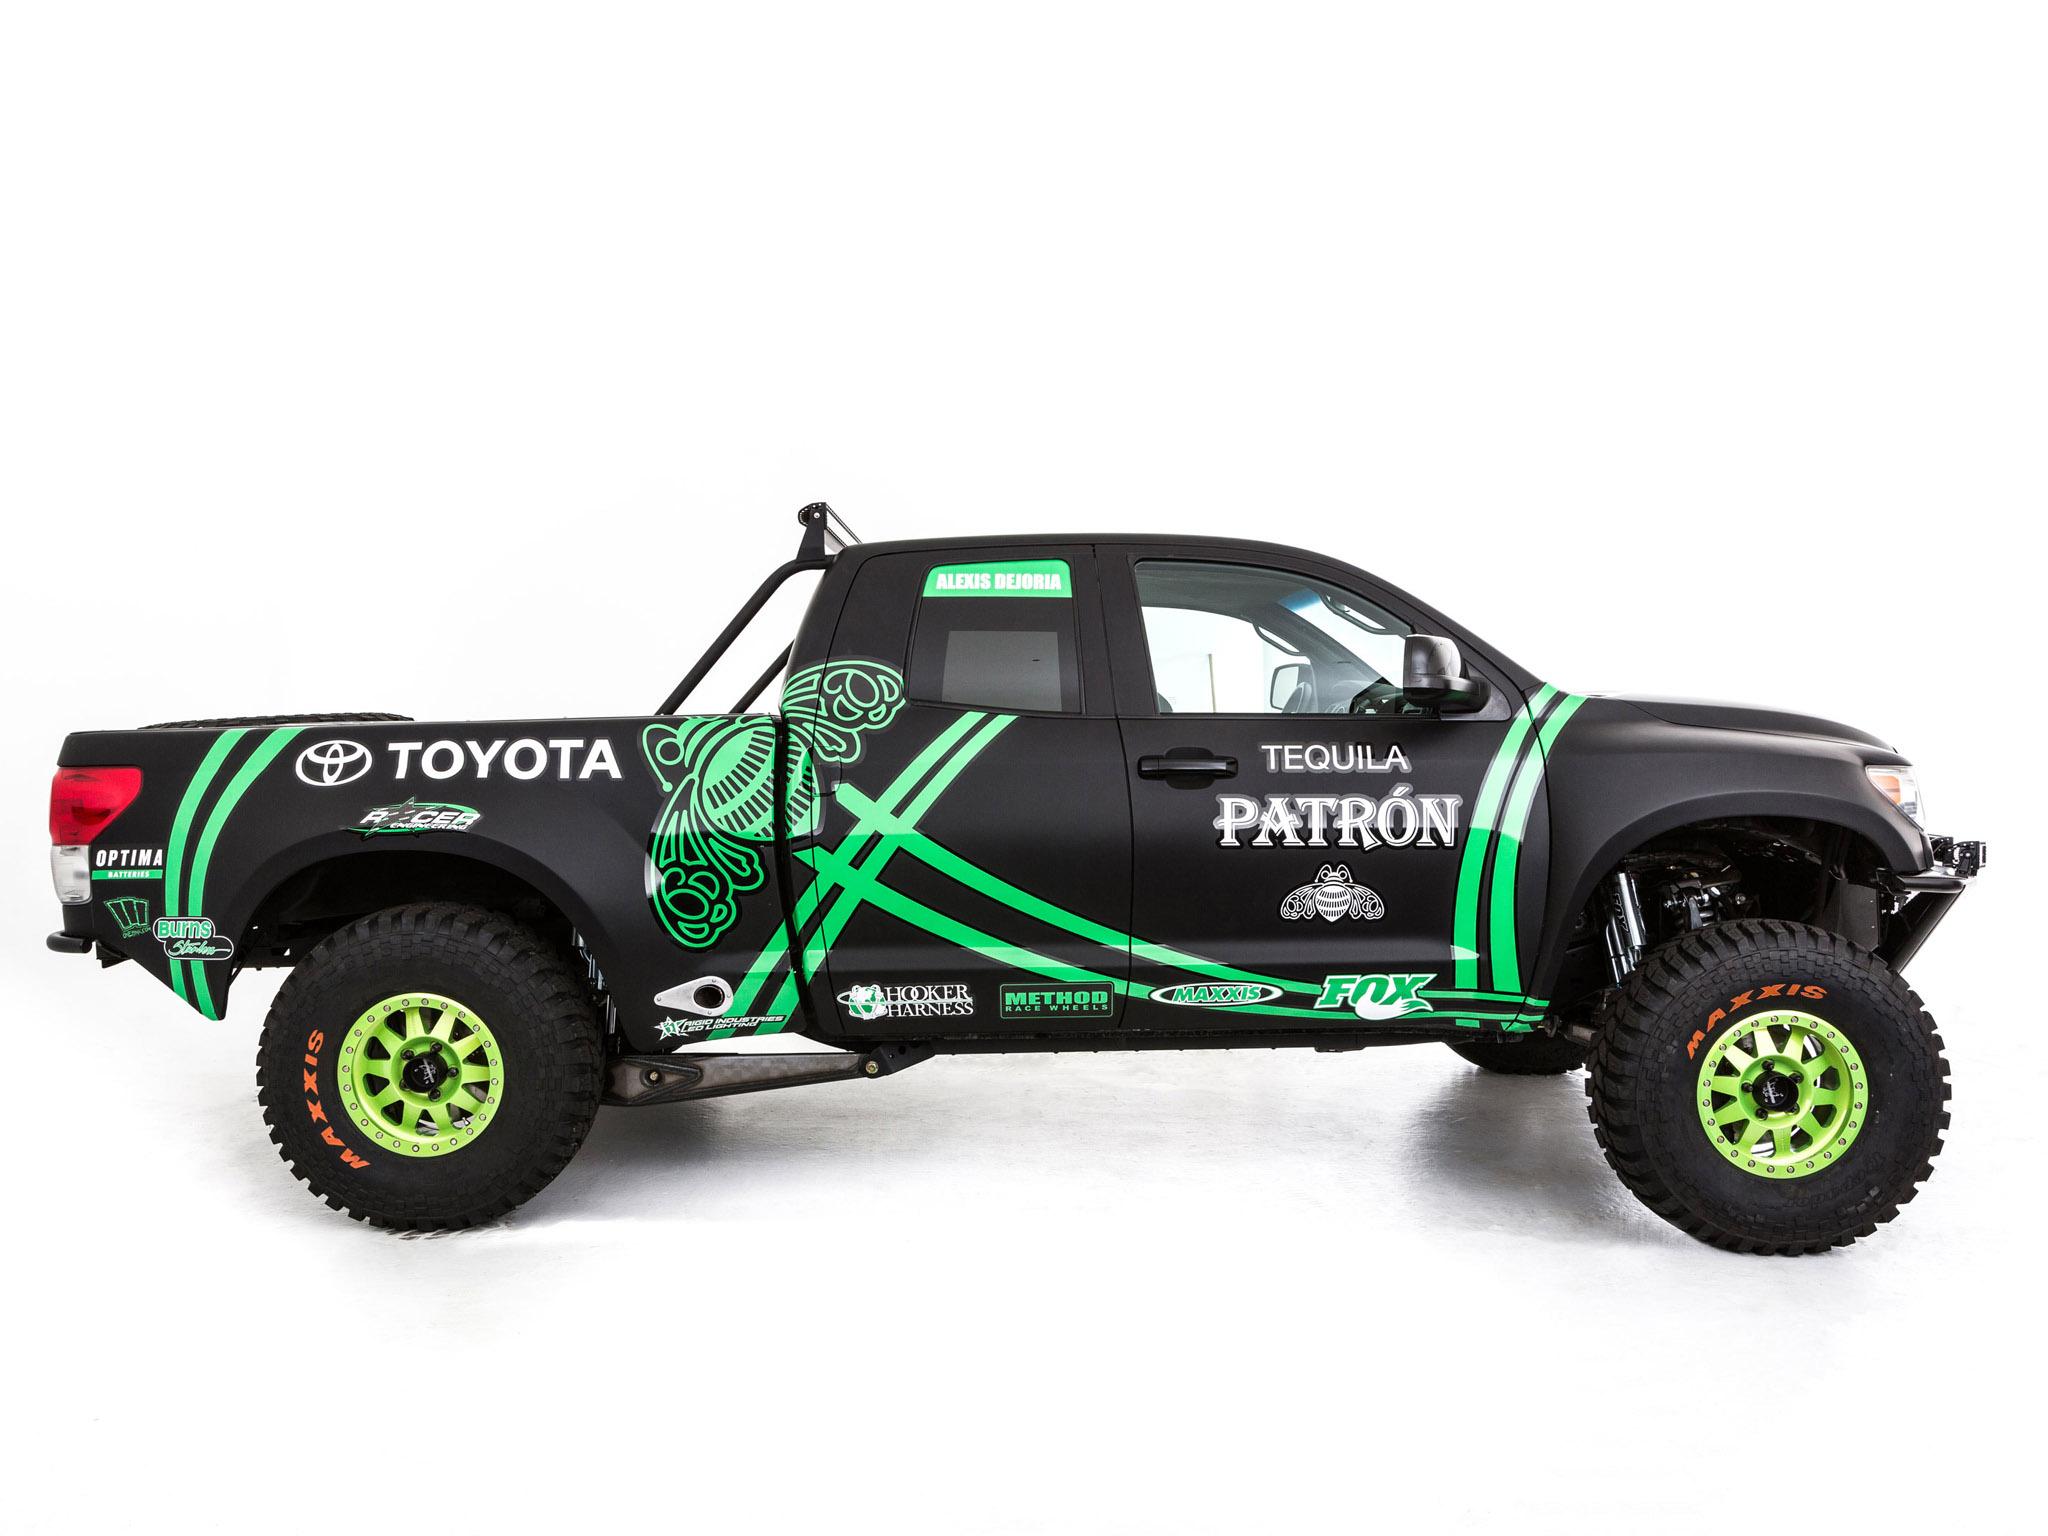 Toyota Tundra Pre-Runner - 2048x1536